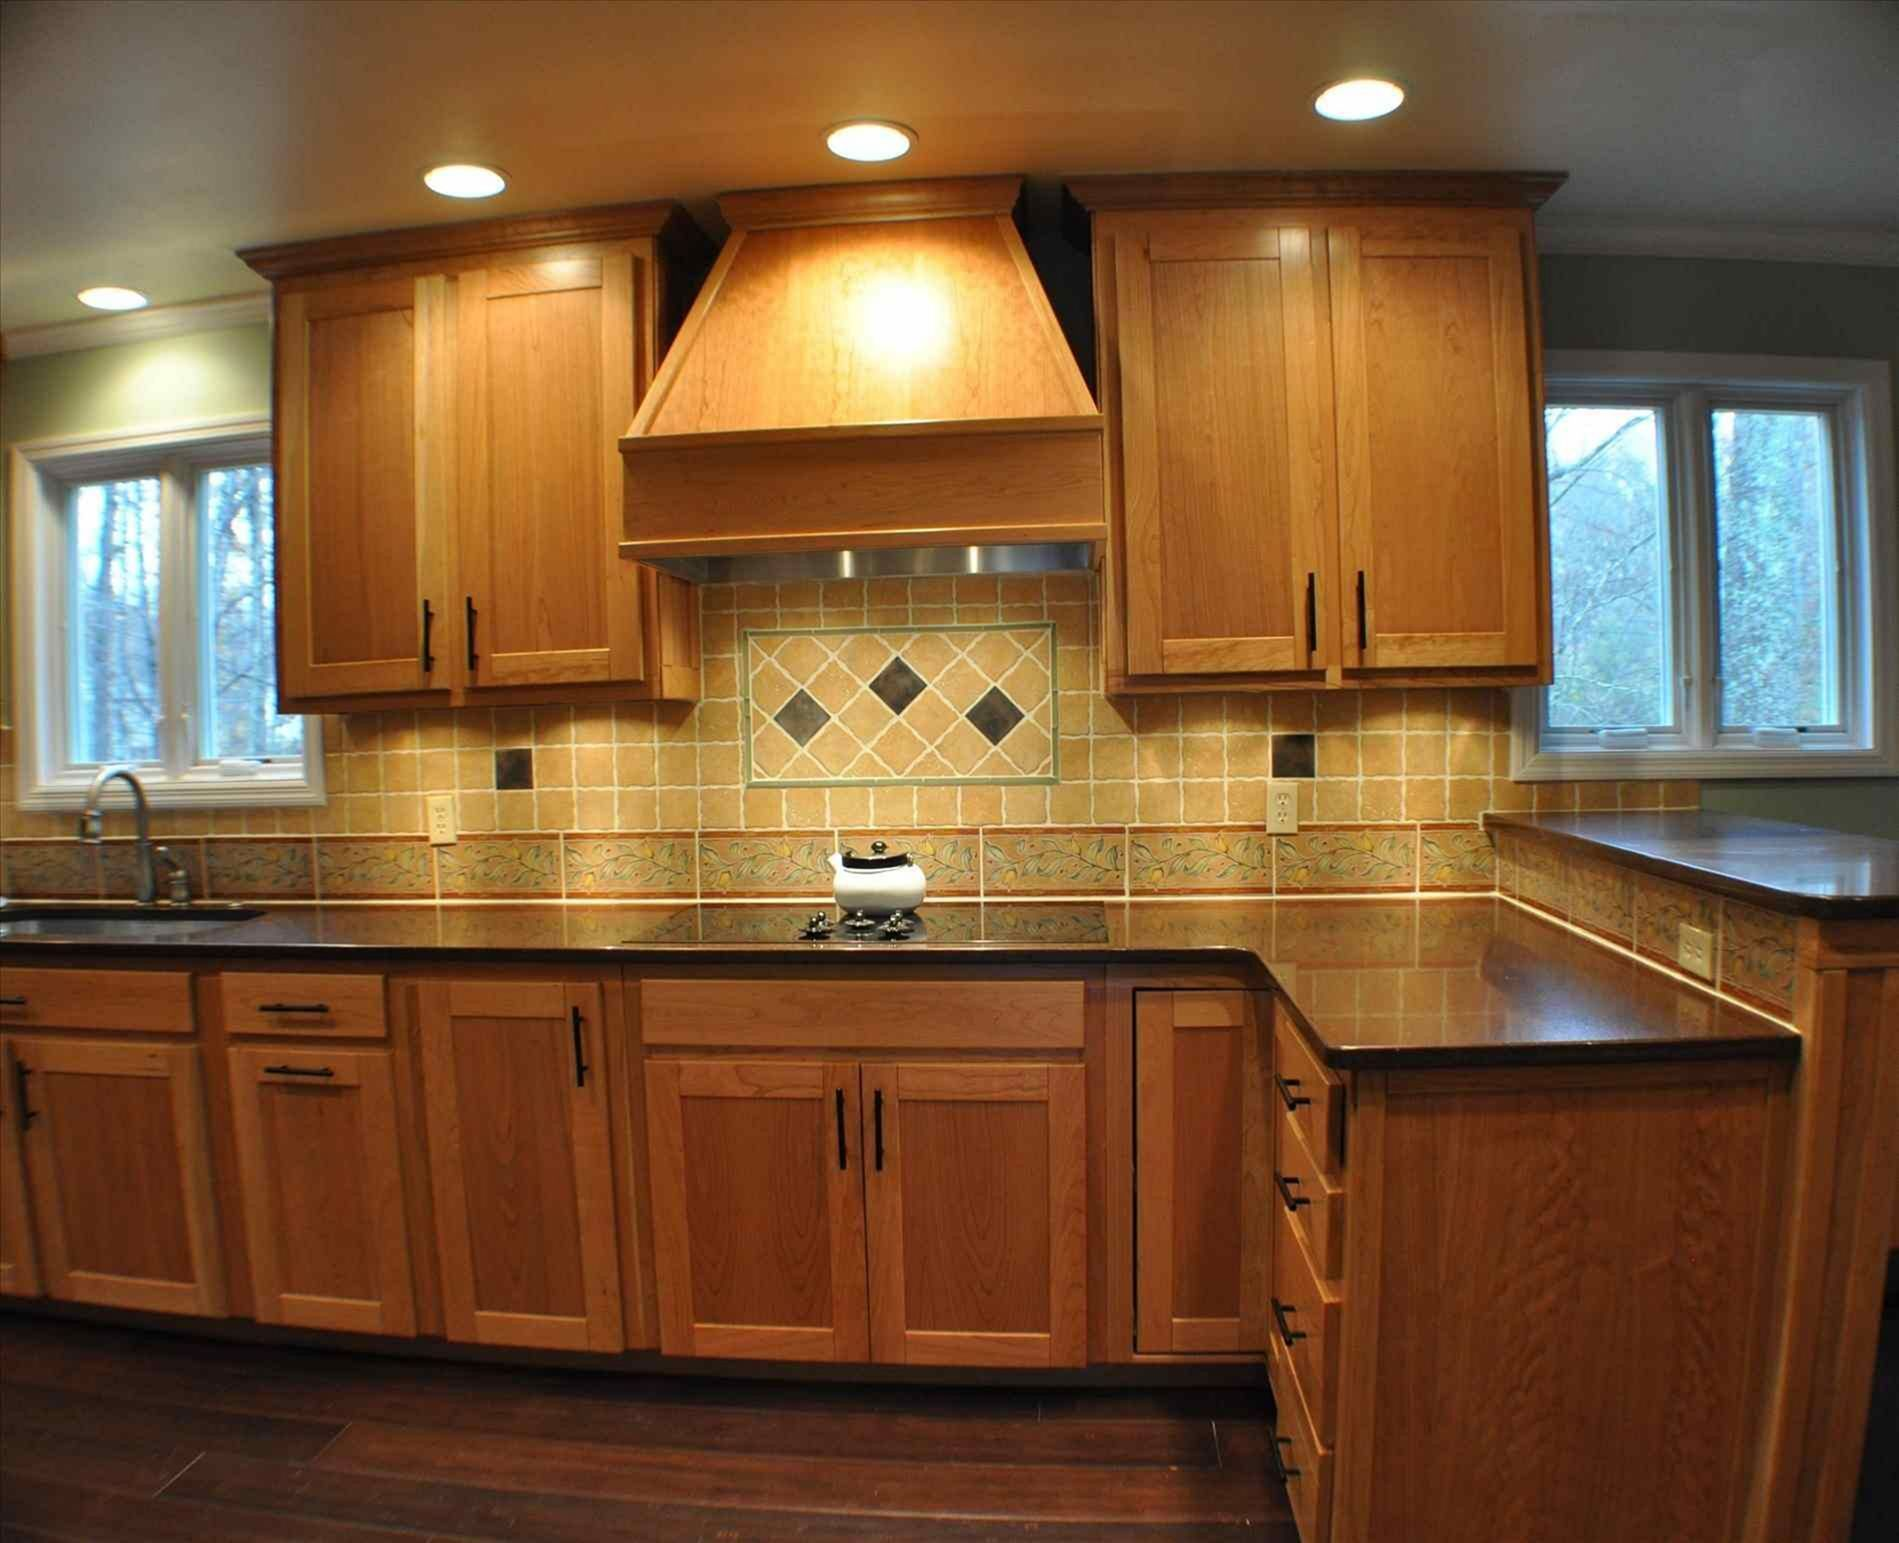 15 Gorgeous Light Cabinets Dark Countertops Design Ideas ... on Dark Maple Cabinets  id=72870